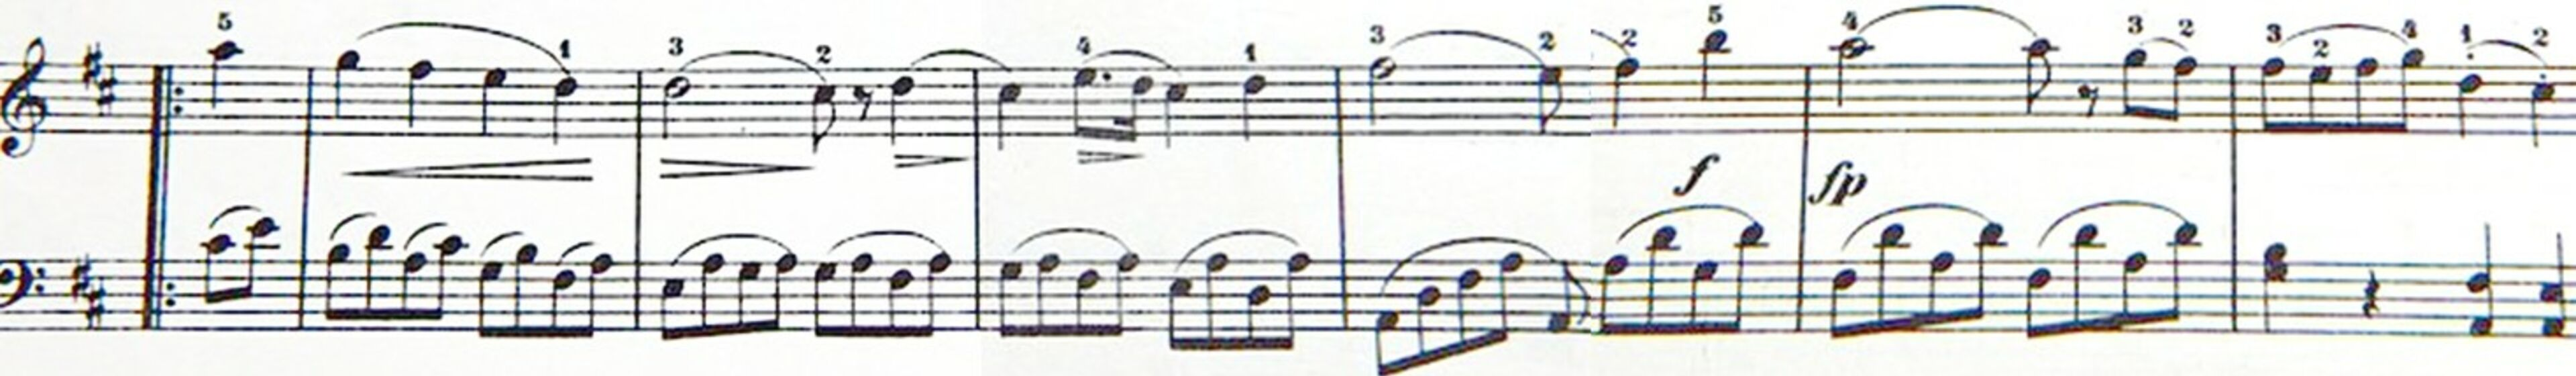 Kopfbild-Noten-2